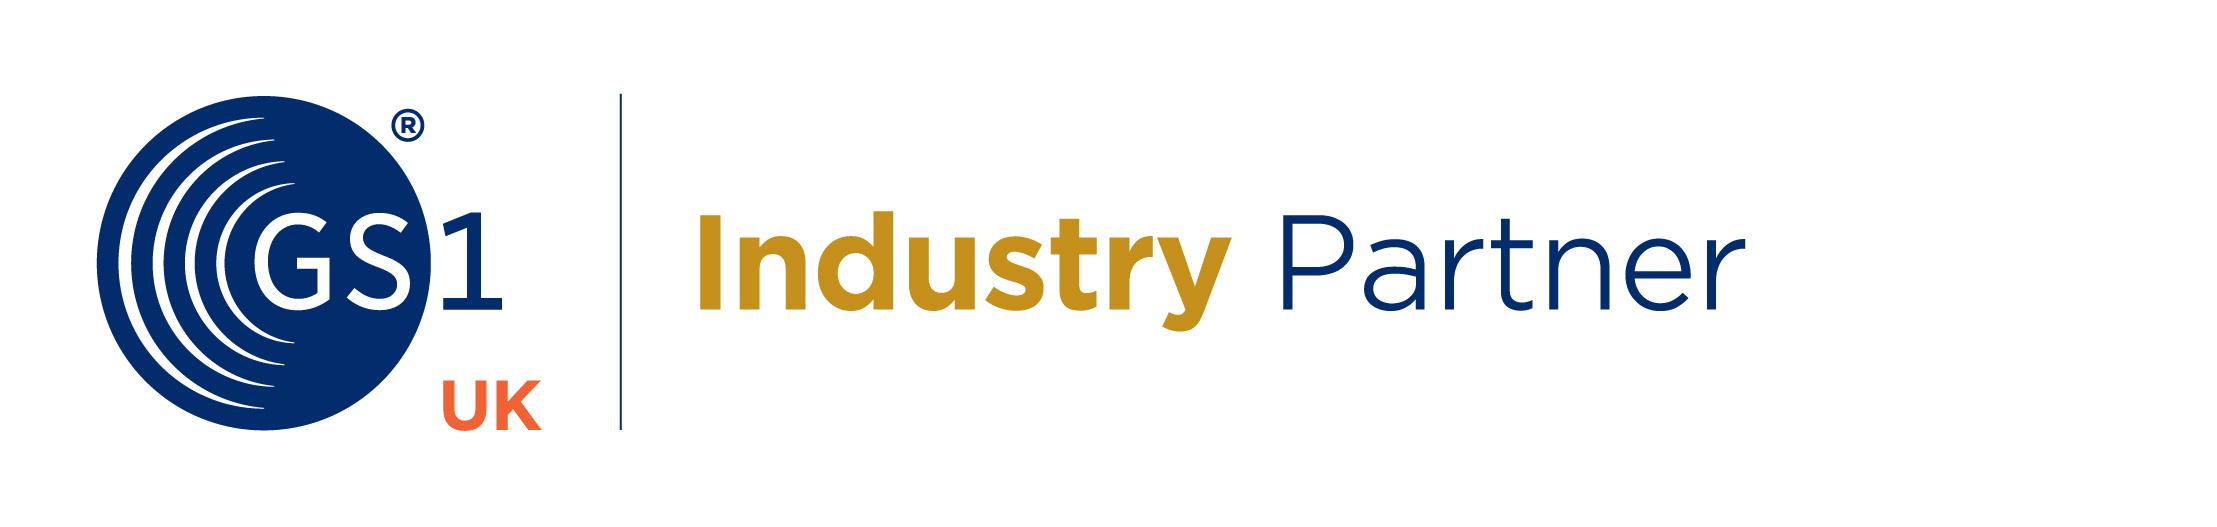 GS1 UK Industry Partner